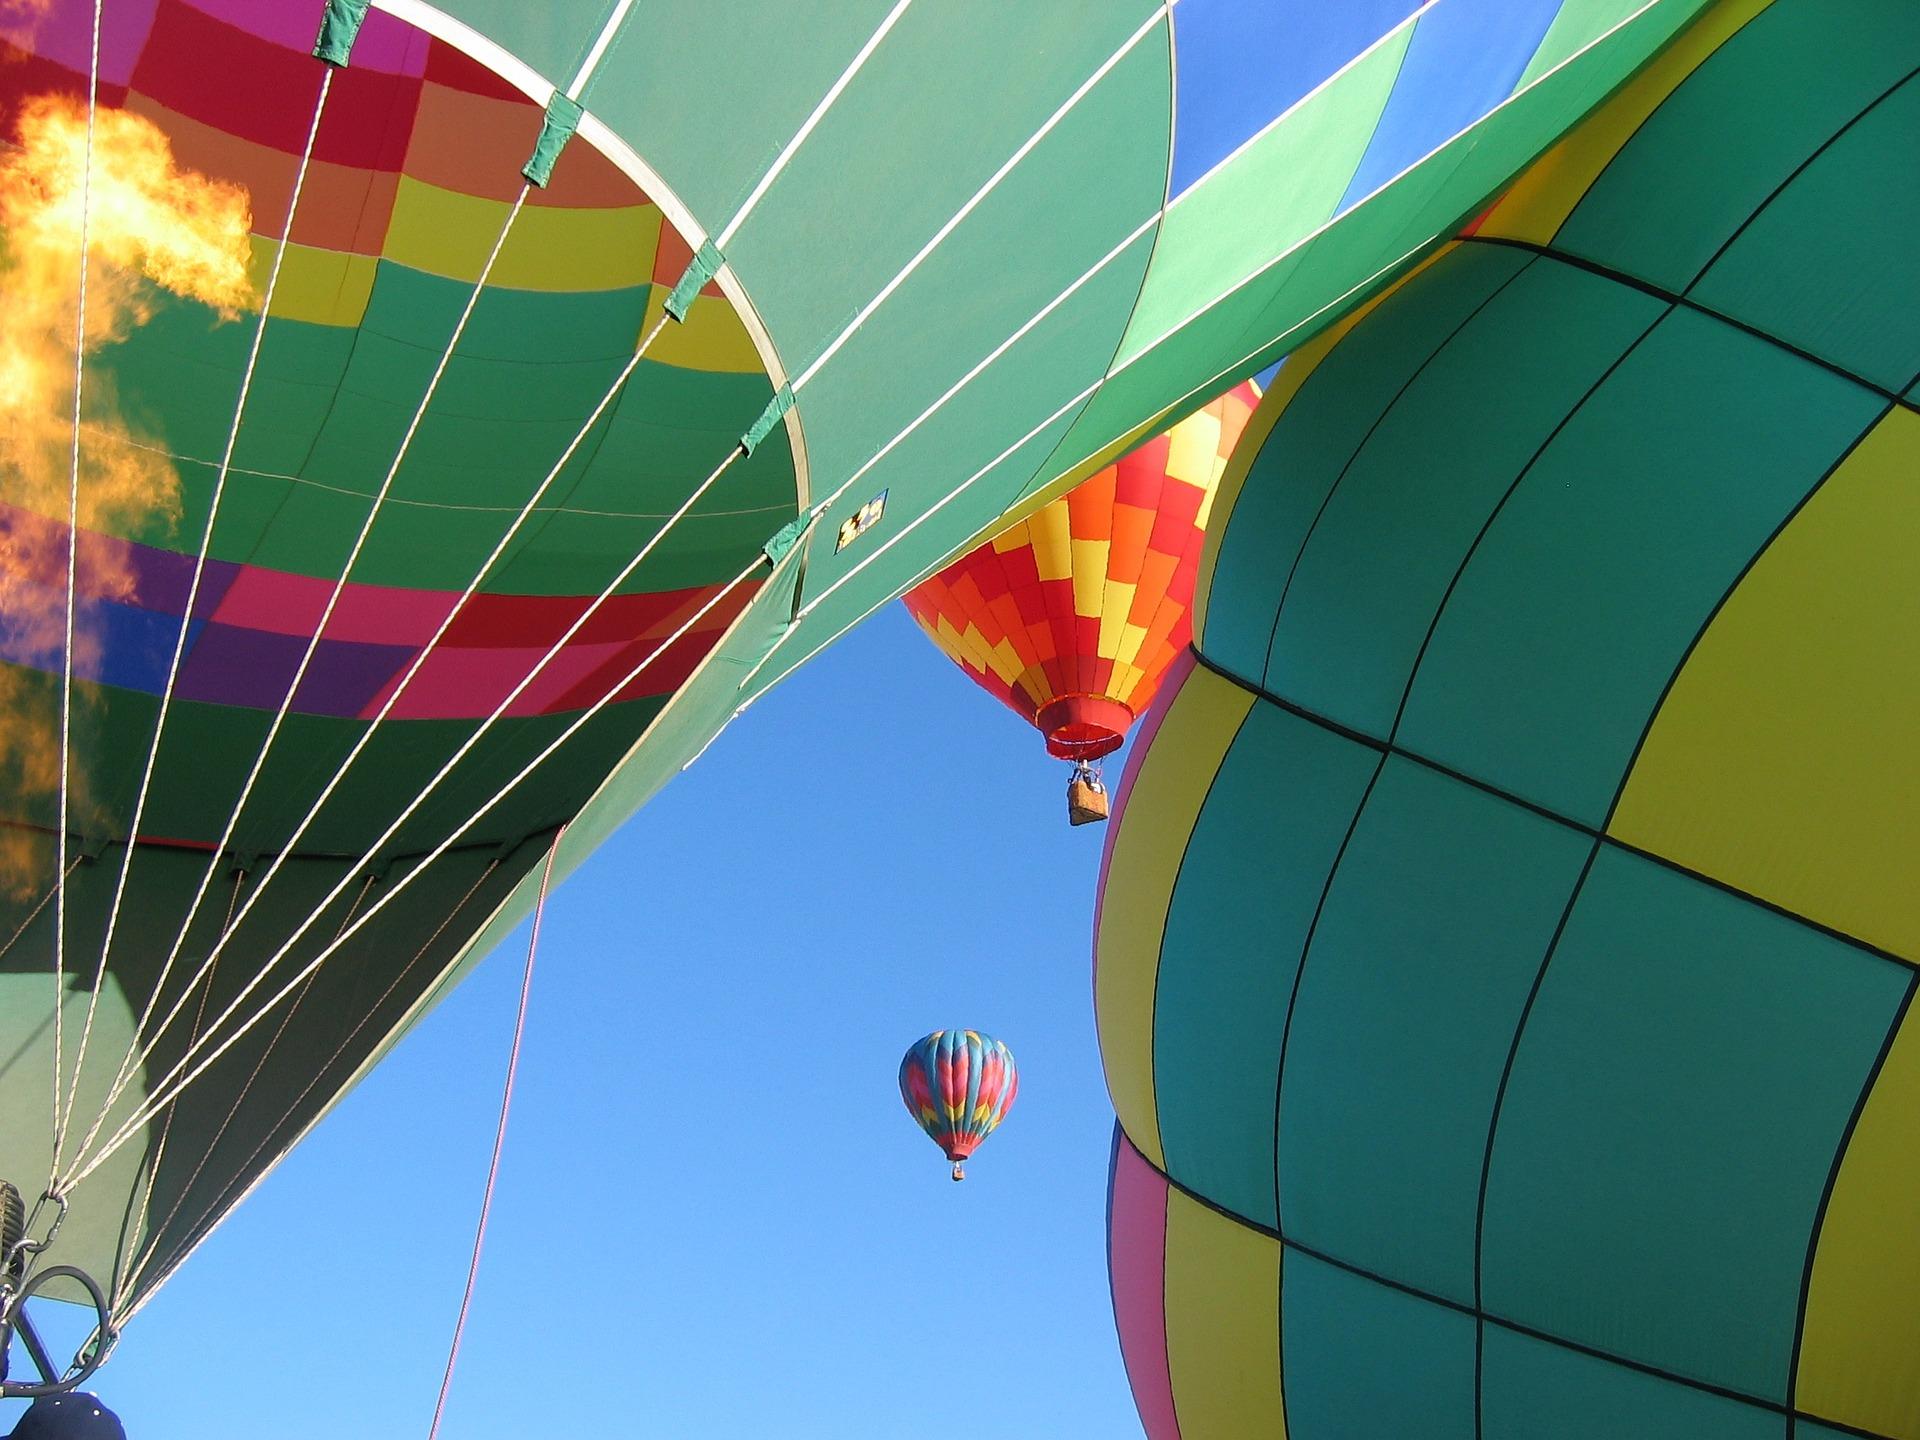 balloons-352590_1920.jpg